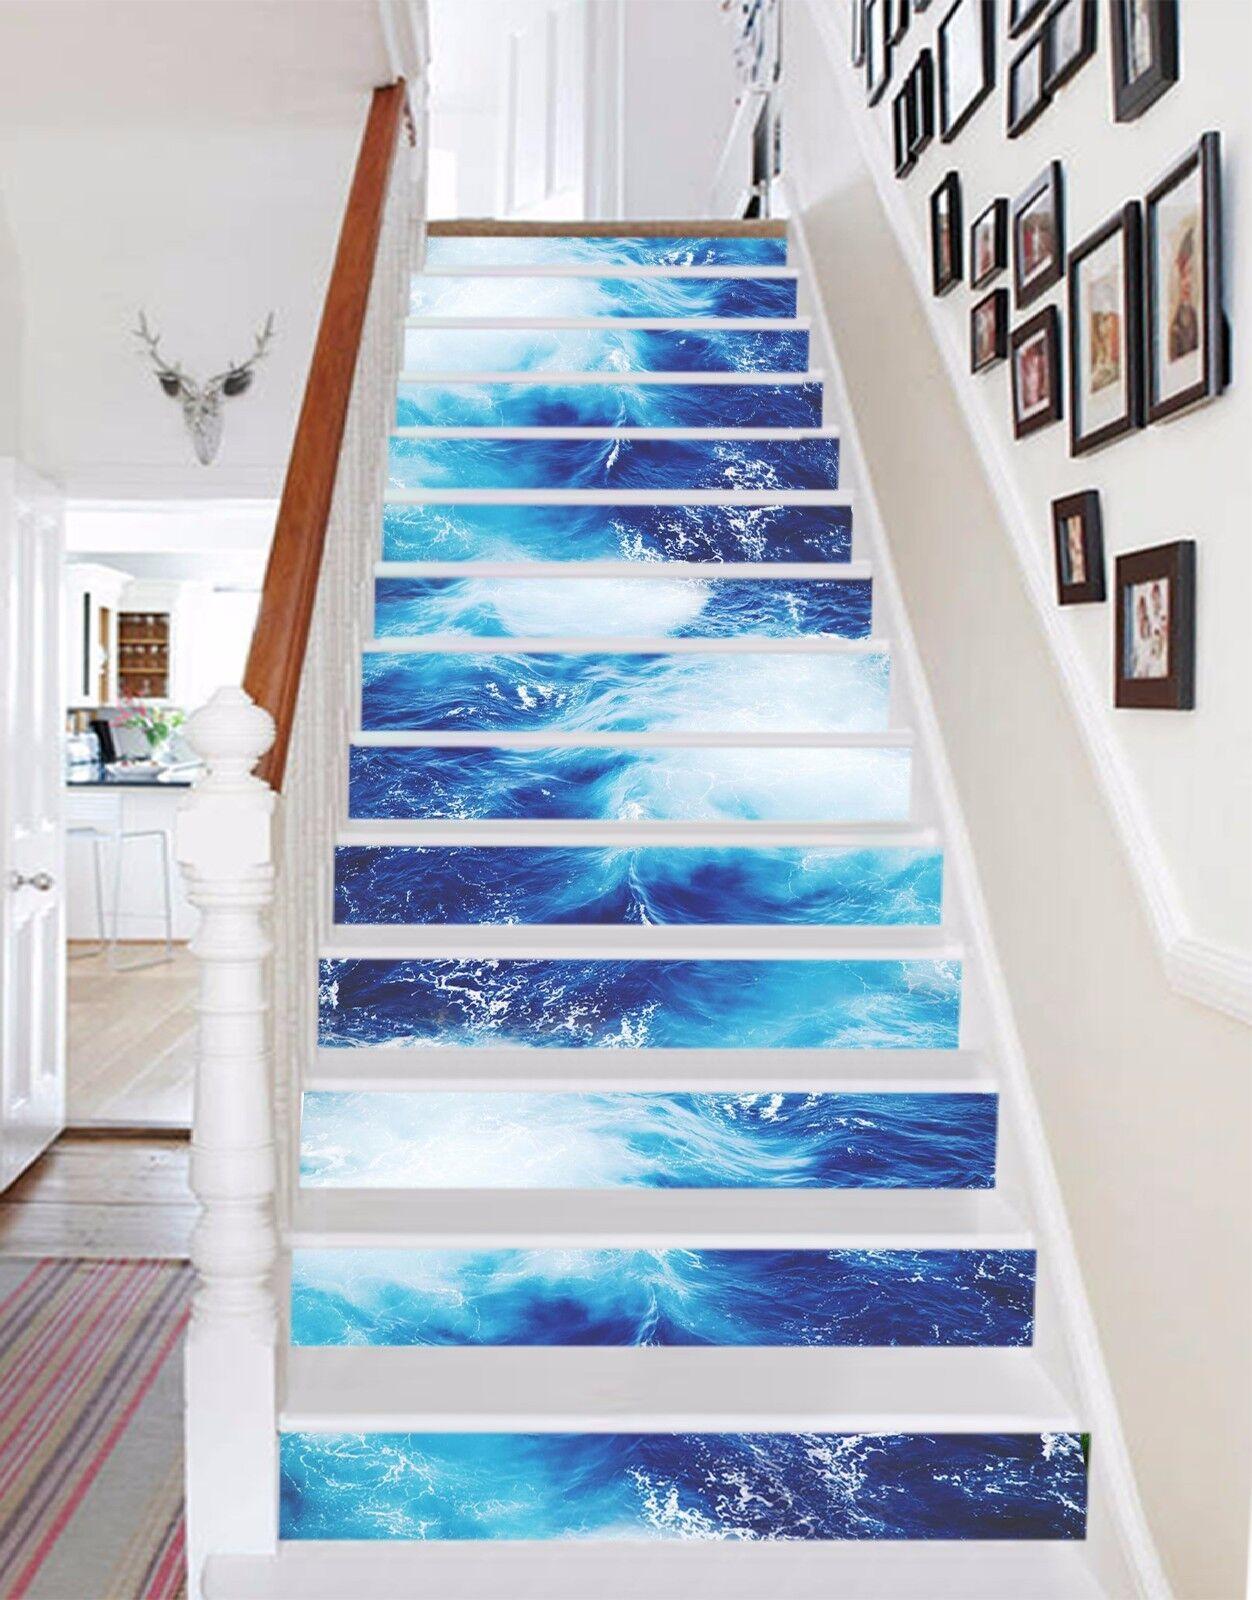 3D 3D 3D Ocean 635 Stair Risers Decoration Photo Mural Vinyl Decal Wallpaper UK c1f92a